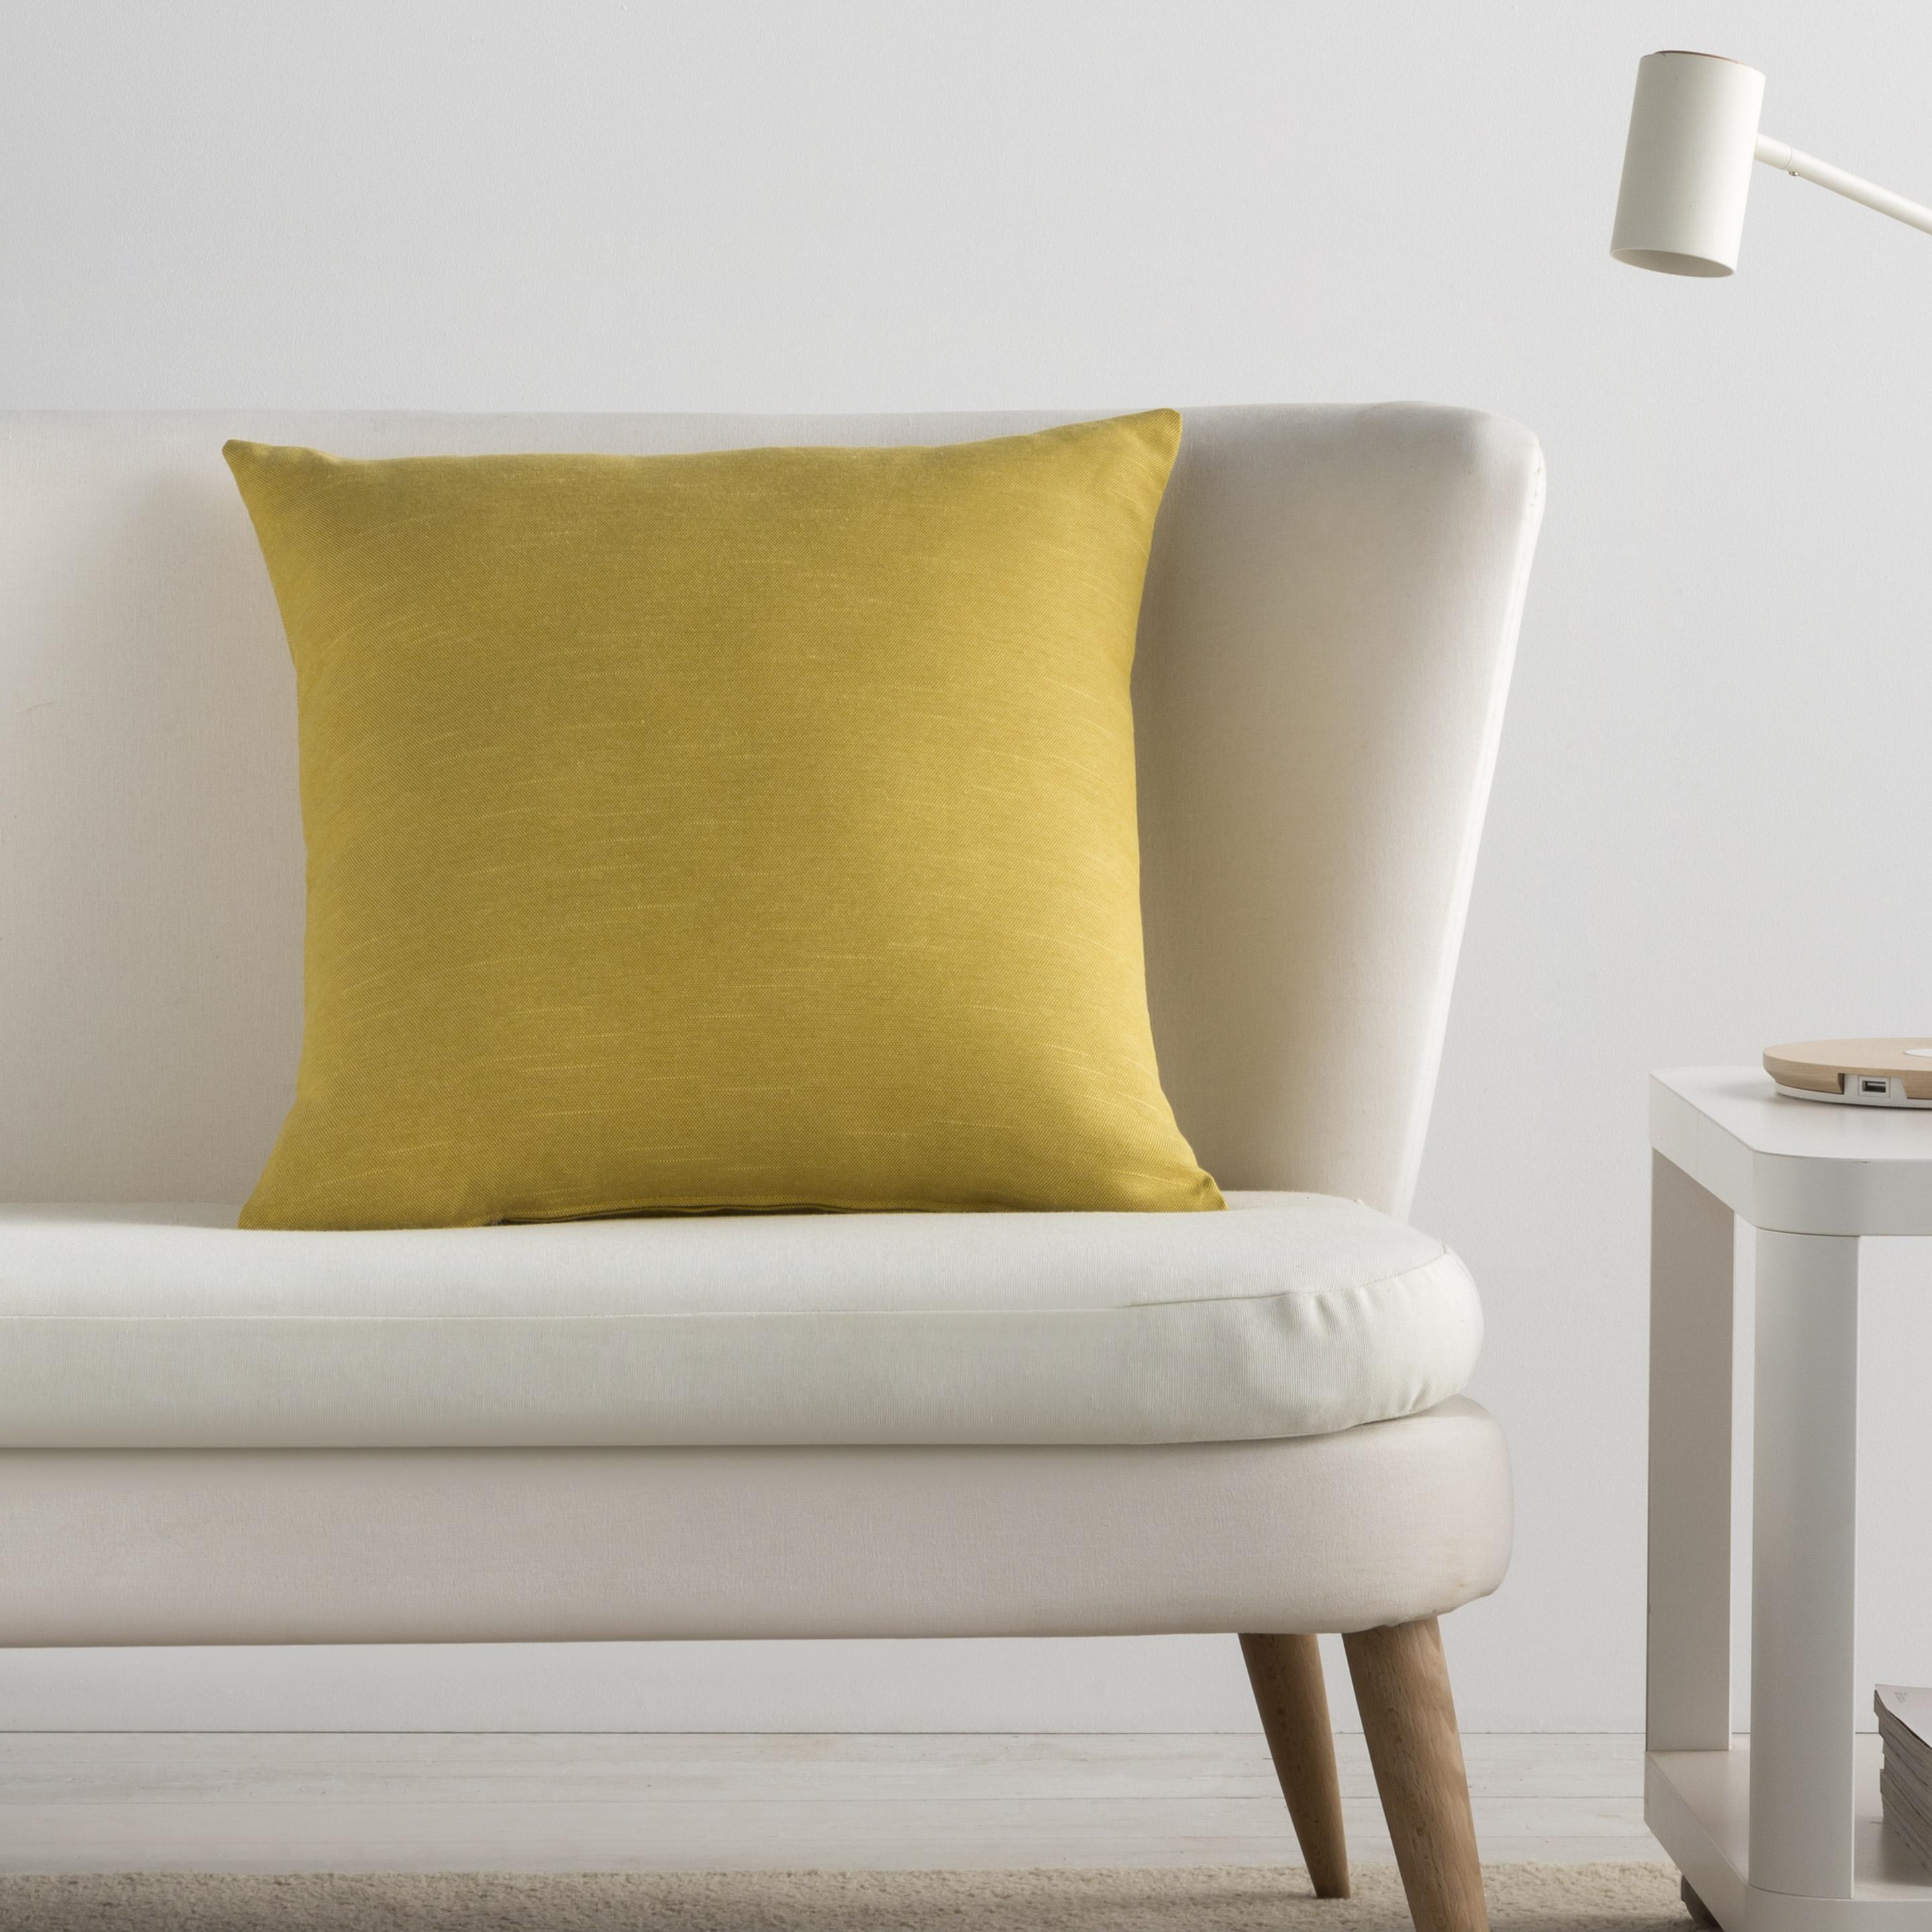 Housse de coussin Indigo, jaune l.50 x H.50 cm